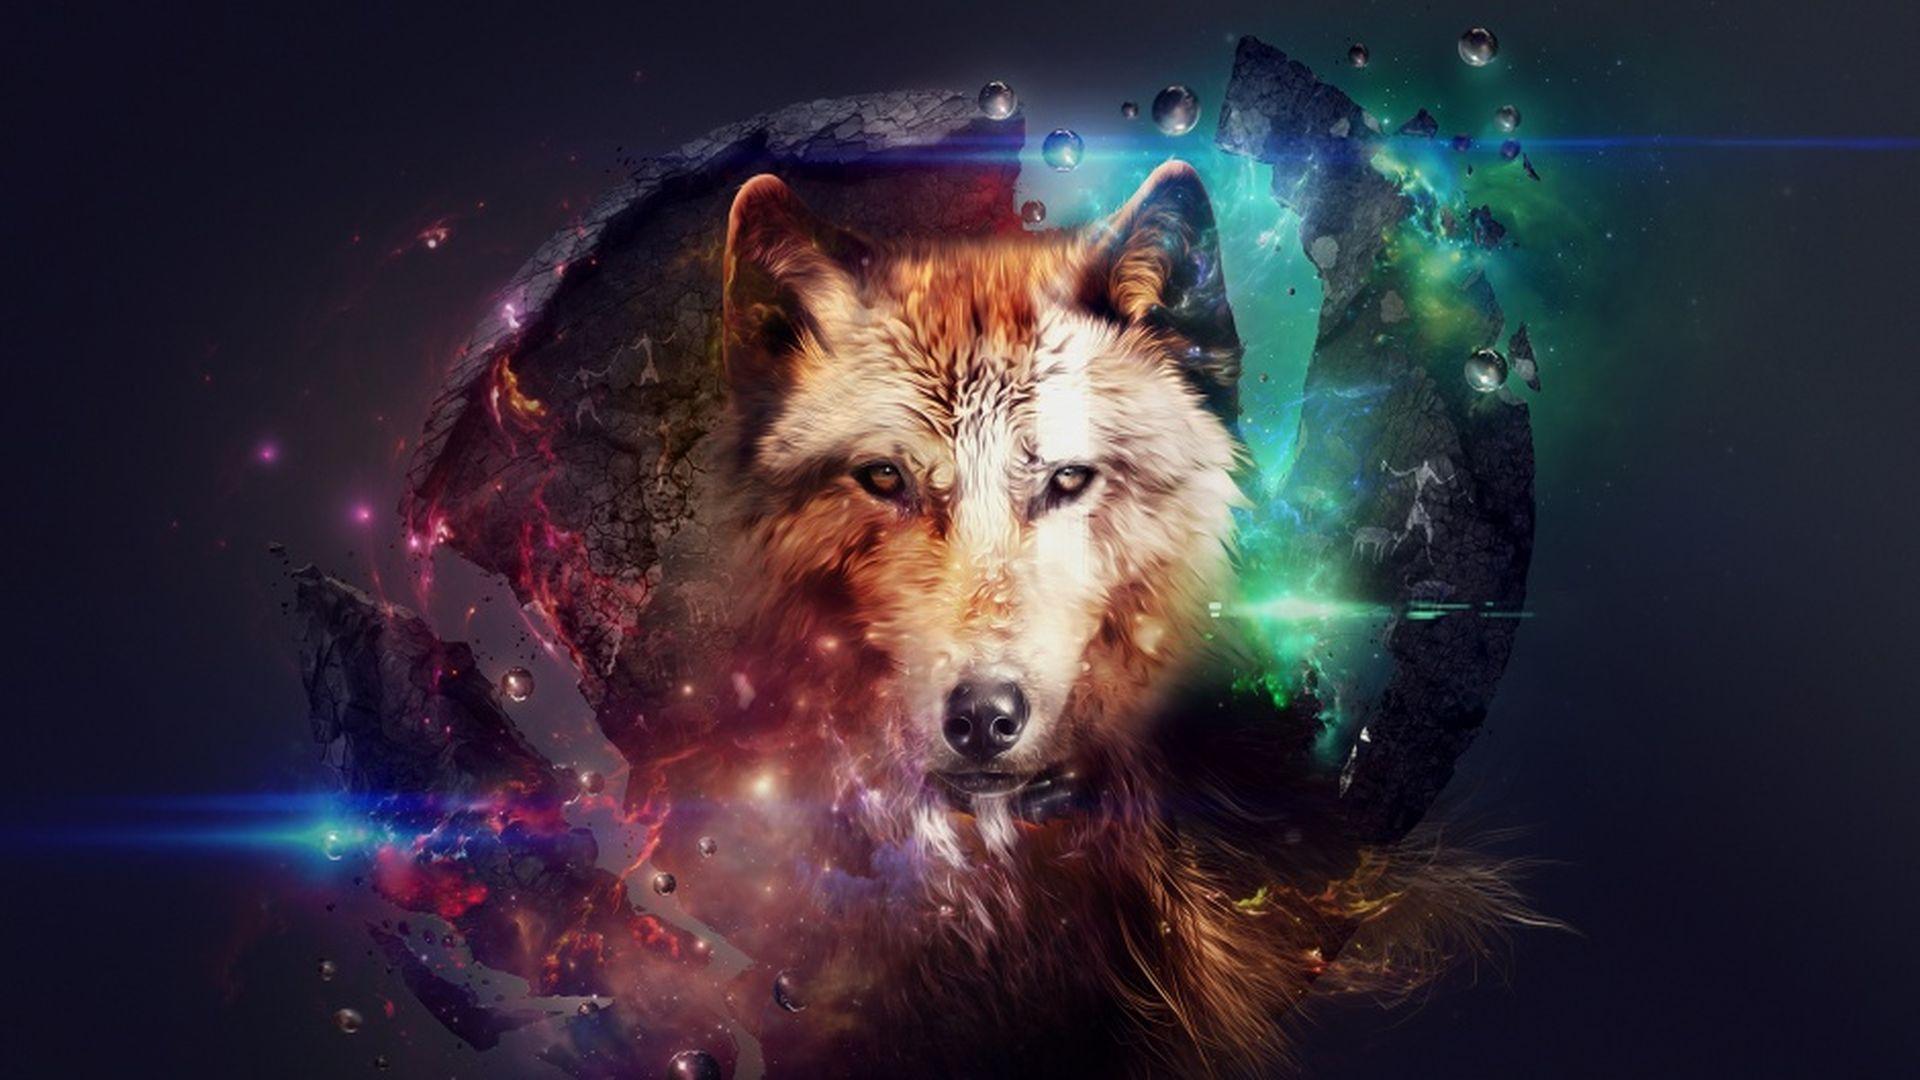 Music Album Abstract Wolf Wolf Wallpaper Wolf Background